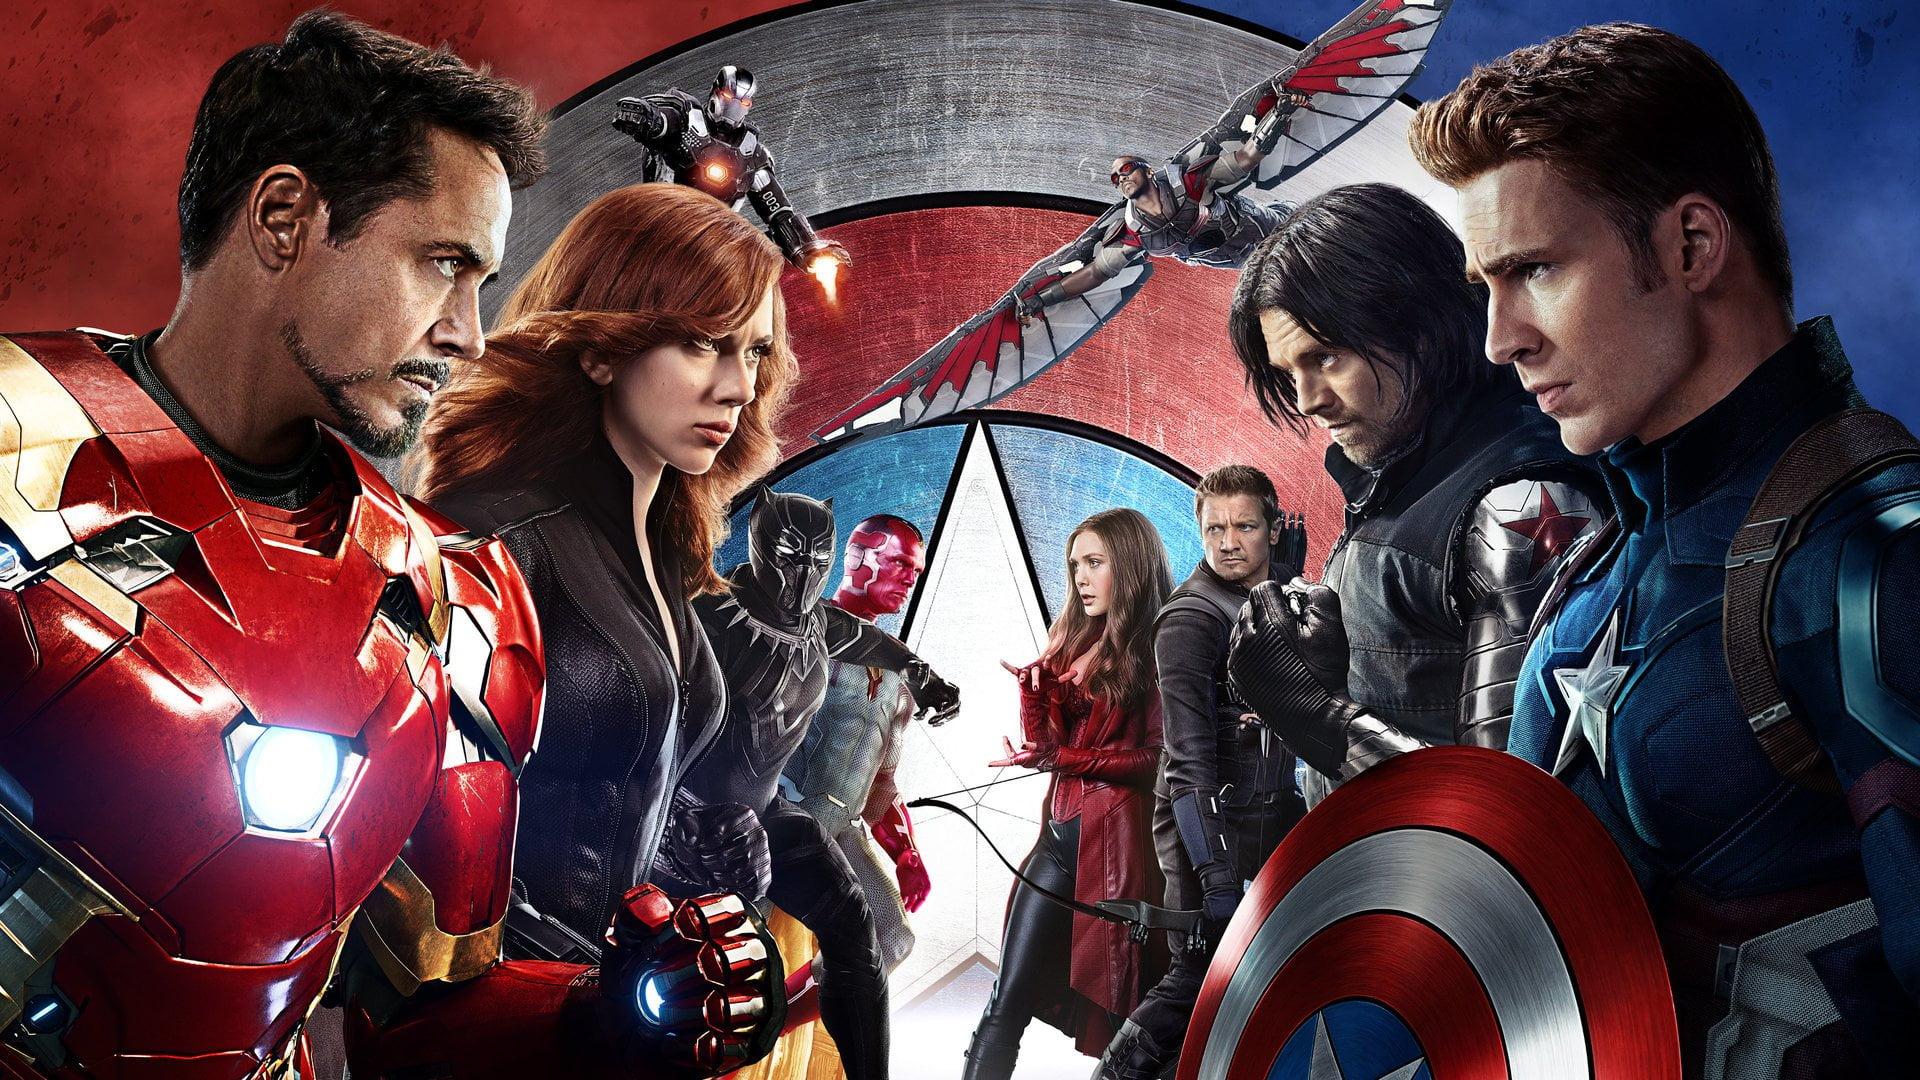 Captain America 3 : Civil War (2016) กัปตัน อเมริกา 3 ศึกฮีโร่ระห่ำโลก